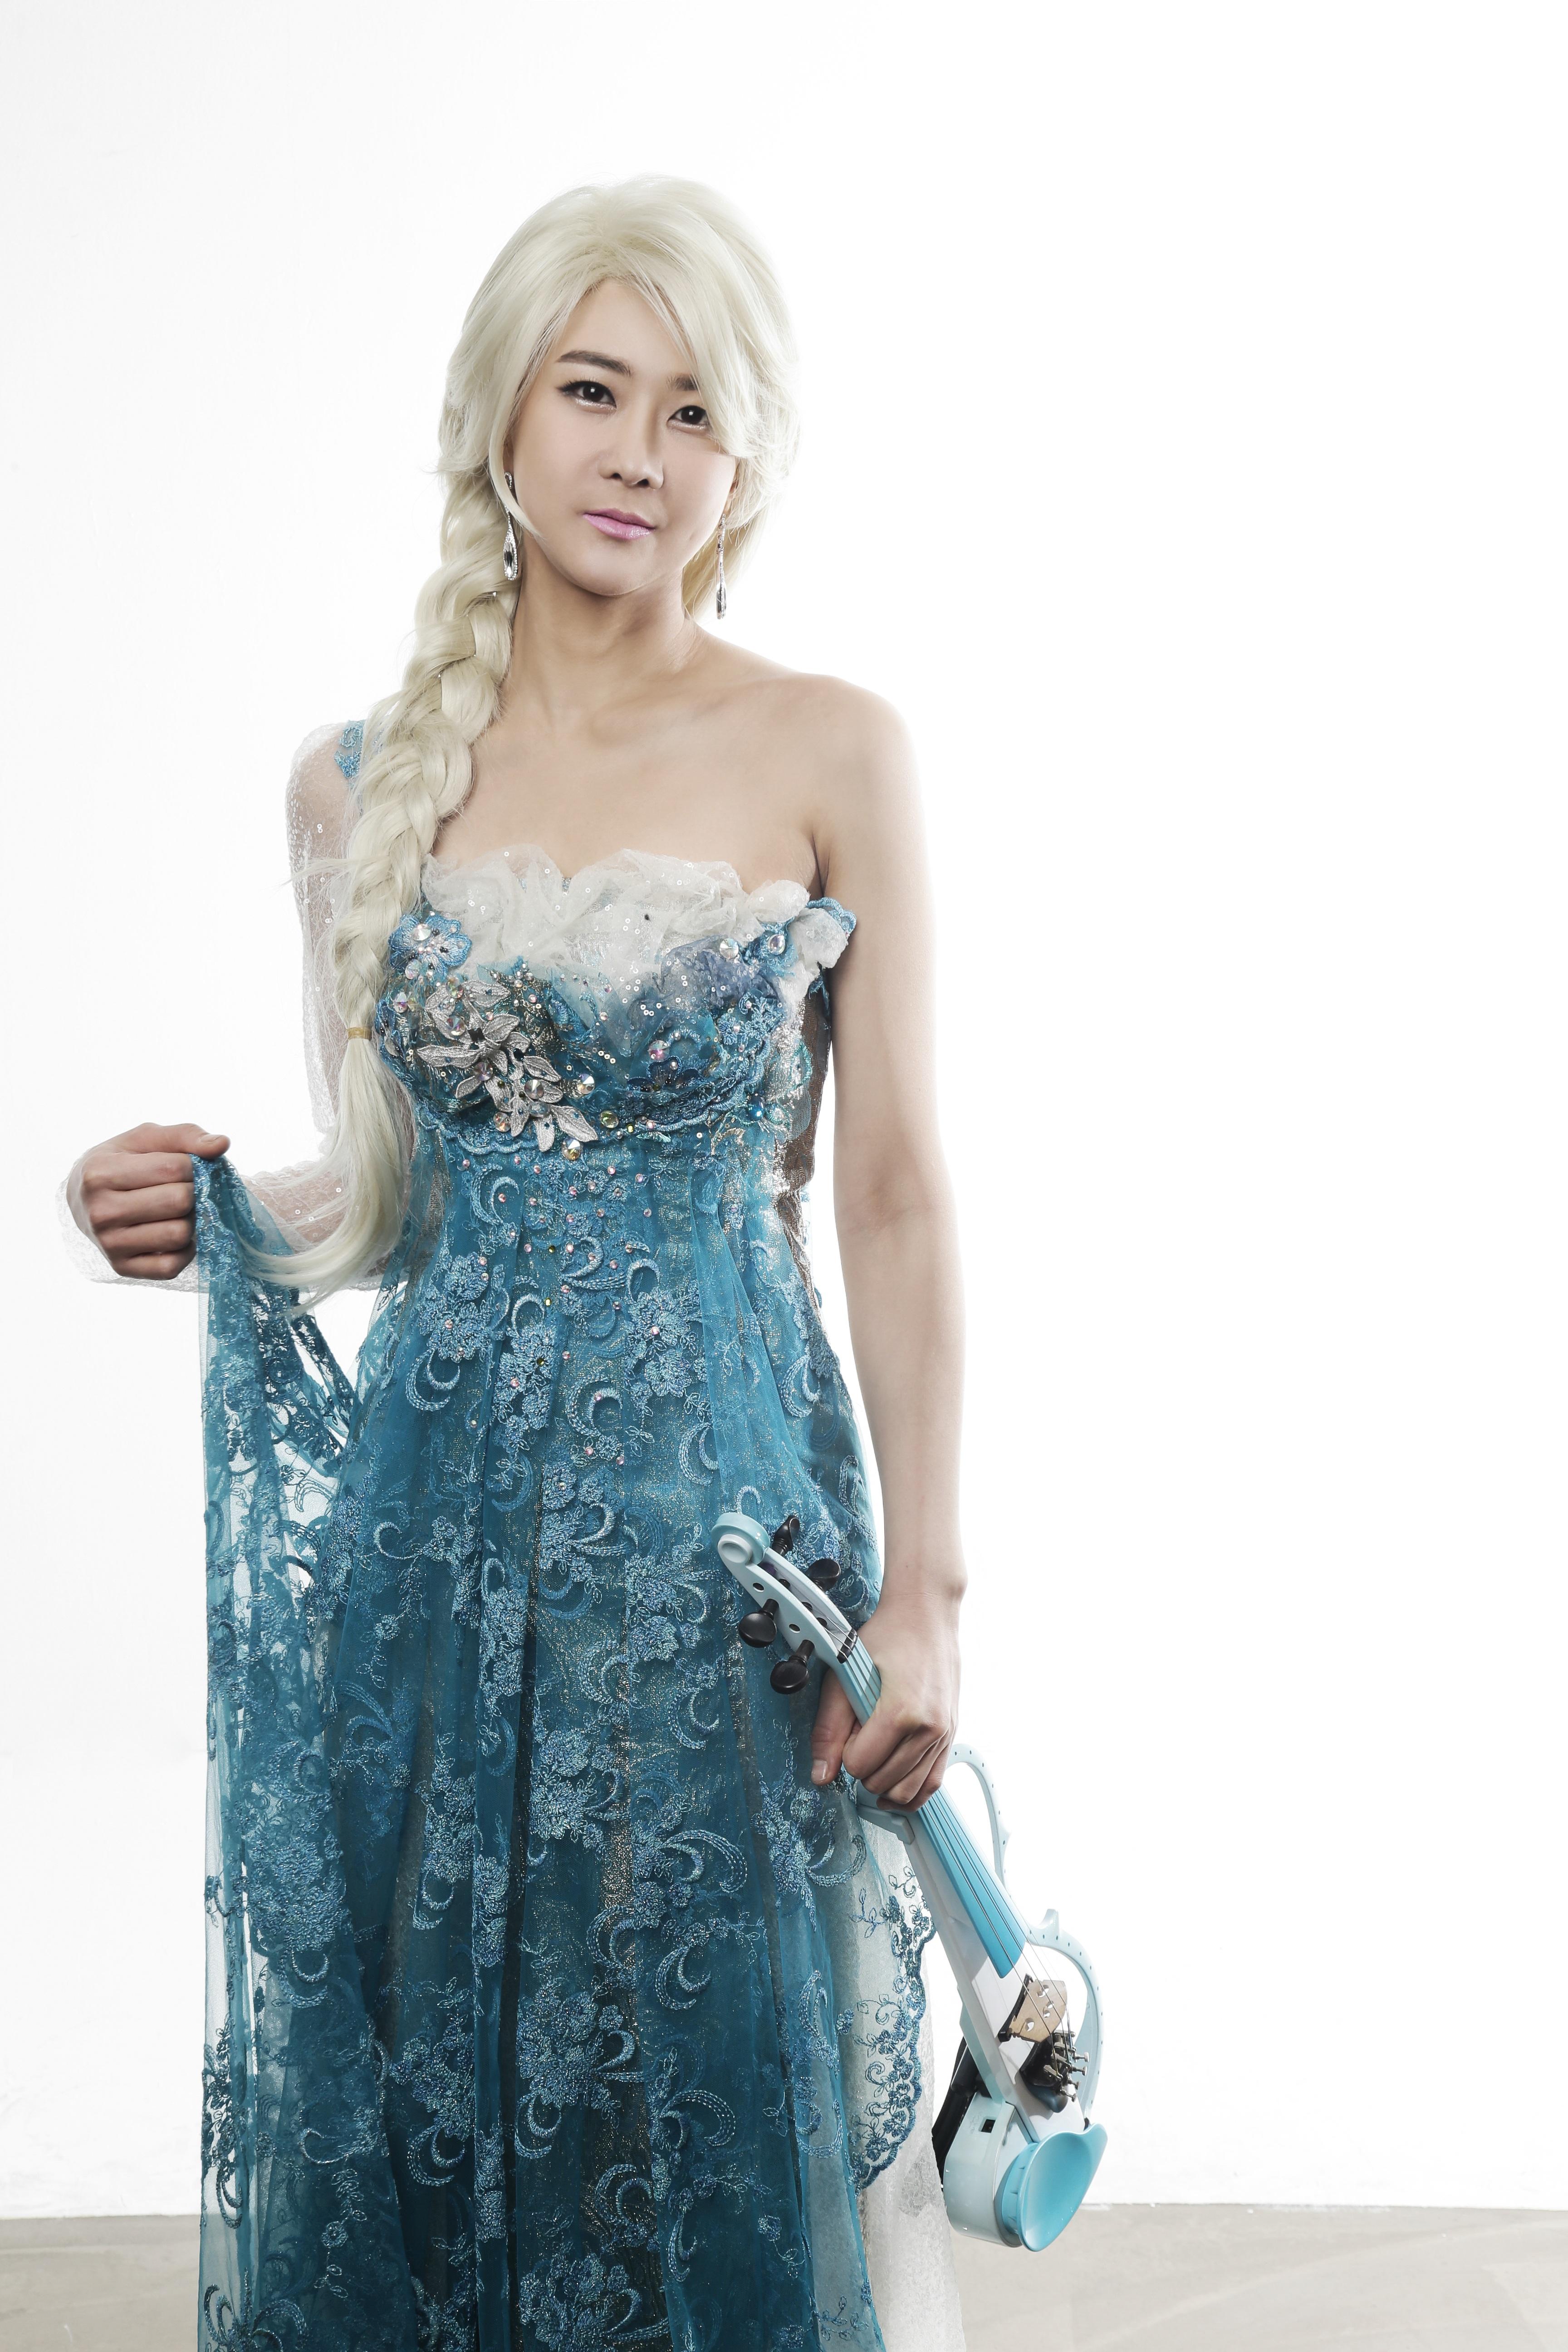 be17a897604b koncert tøj bryllupskjole violin tekstil cosplay kjole prom kjole brudepige  violinist Photo shoot vinter rige al